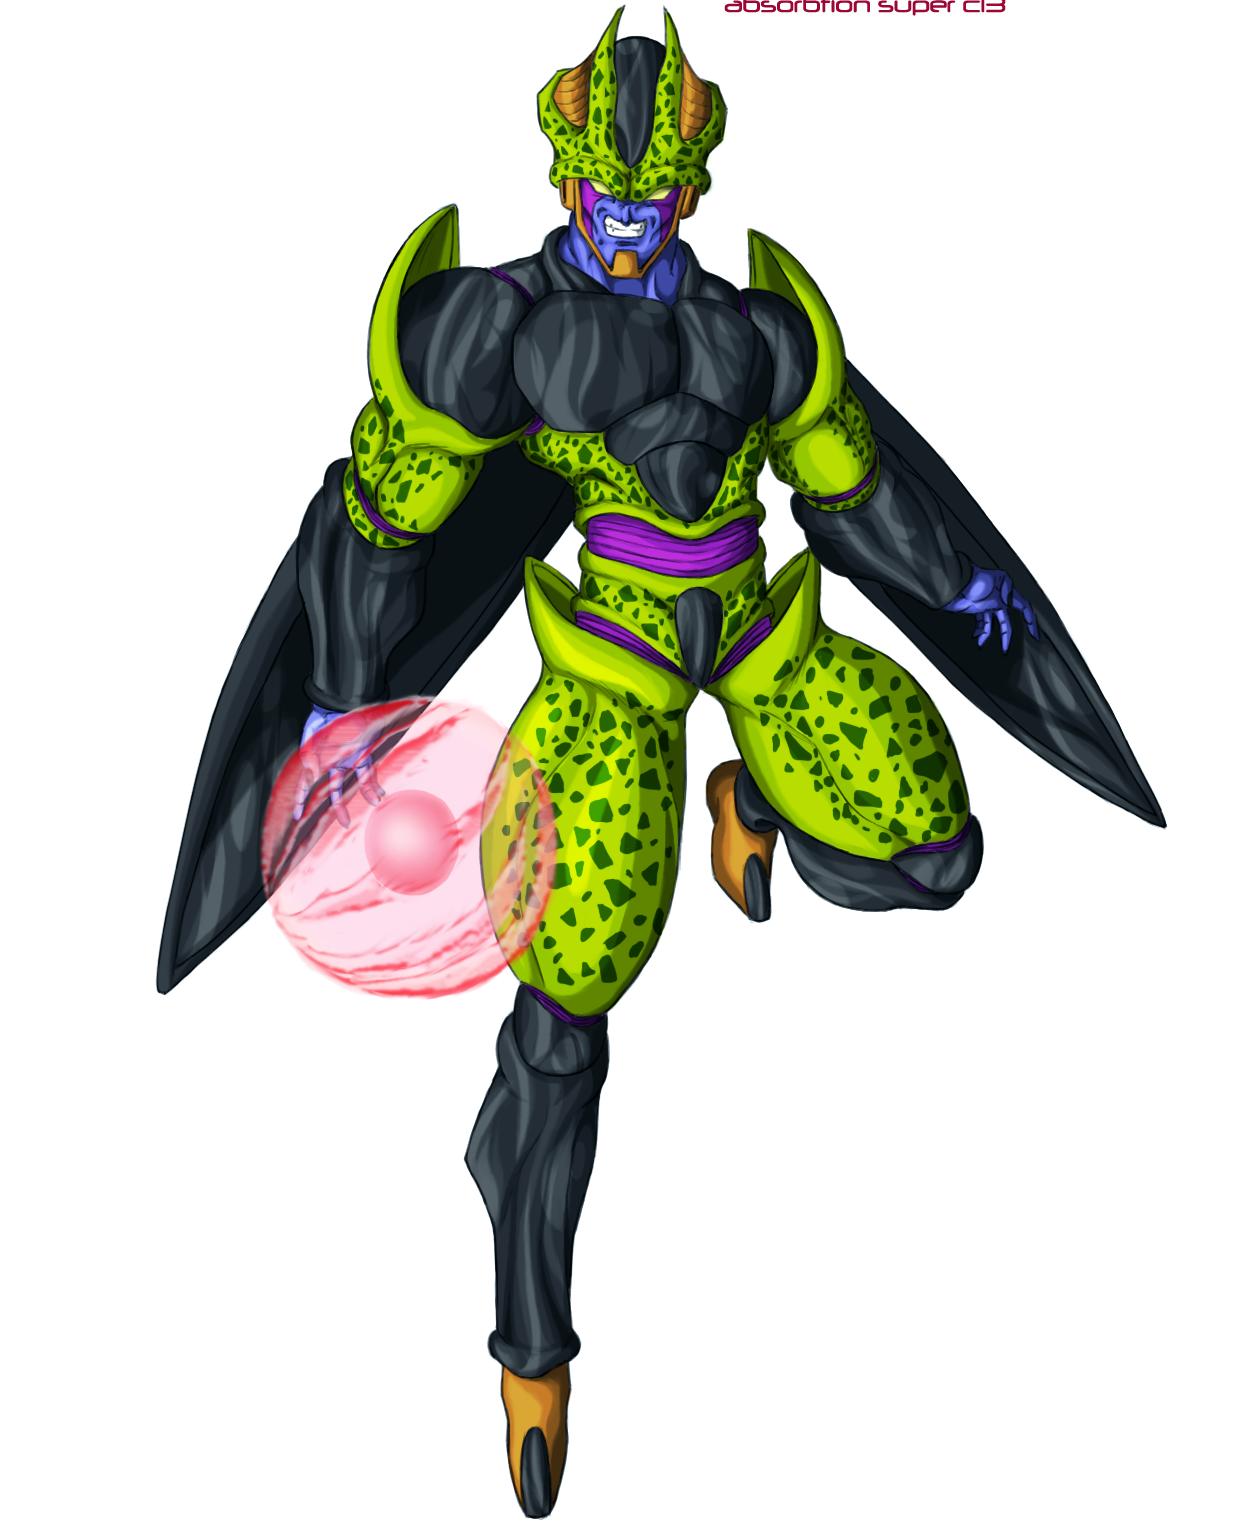 Dragon ball multiverse the origin of nameko dragonball fanon wiki fandom powered by wikia - Super cell dbz ...